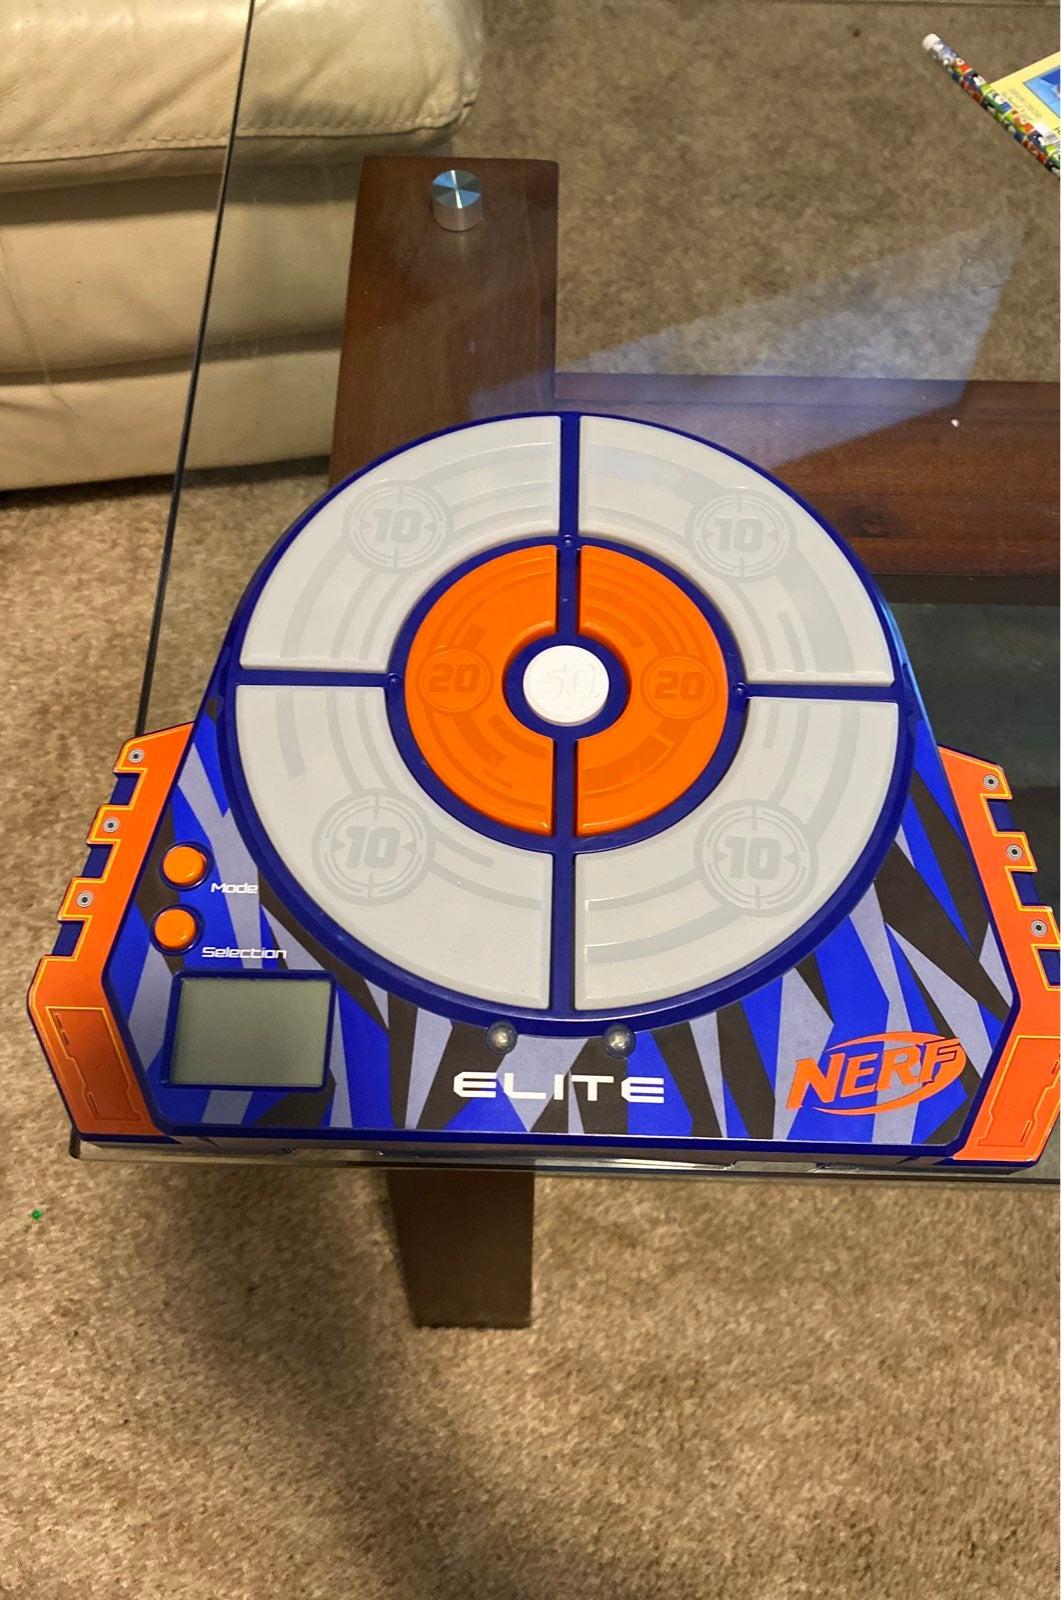 Nerf Elite Target